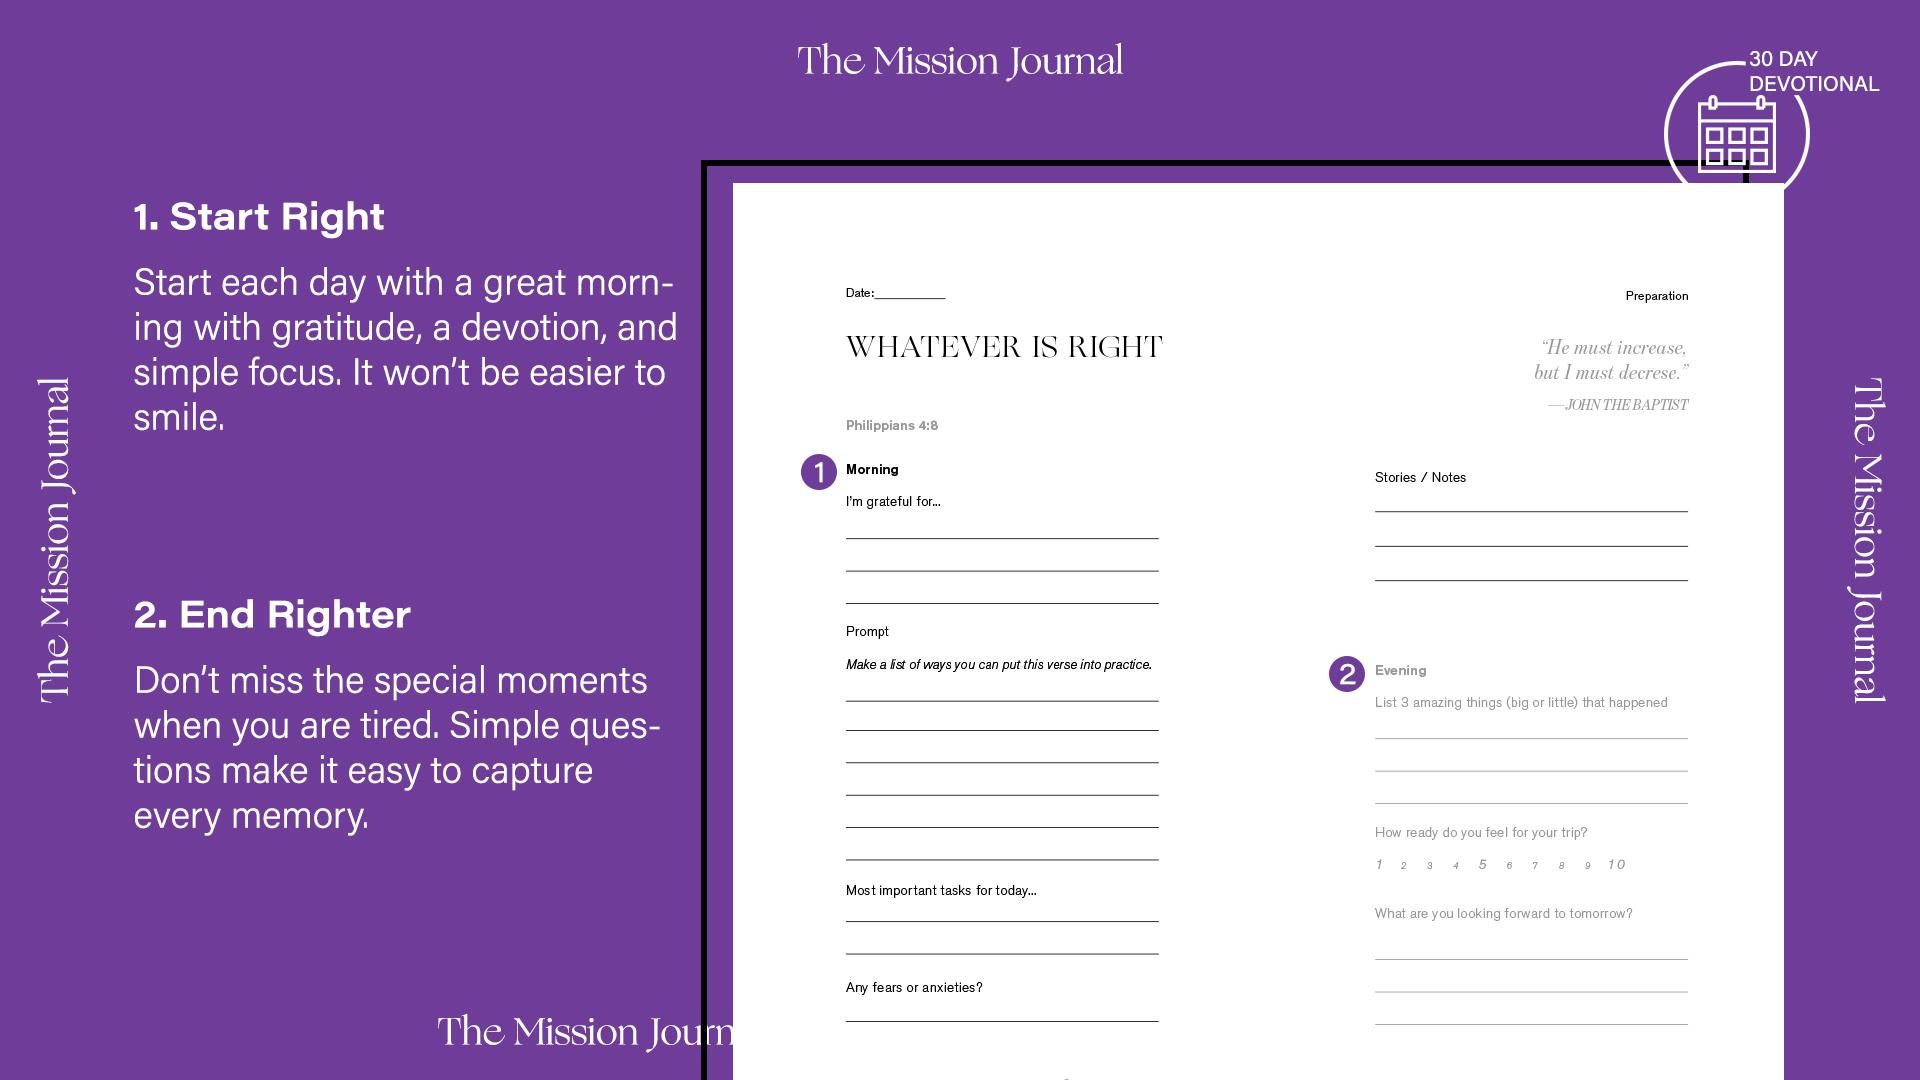 Mission Trip JournalArtboard 1 copy 9.jpg